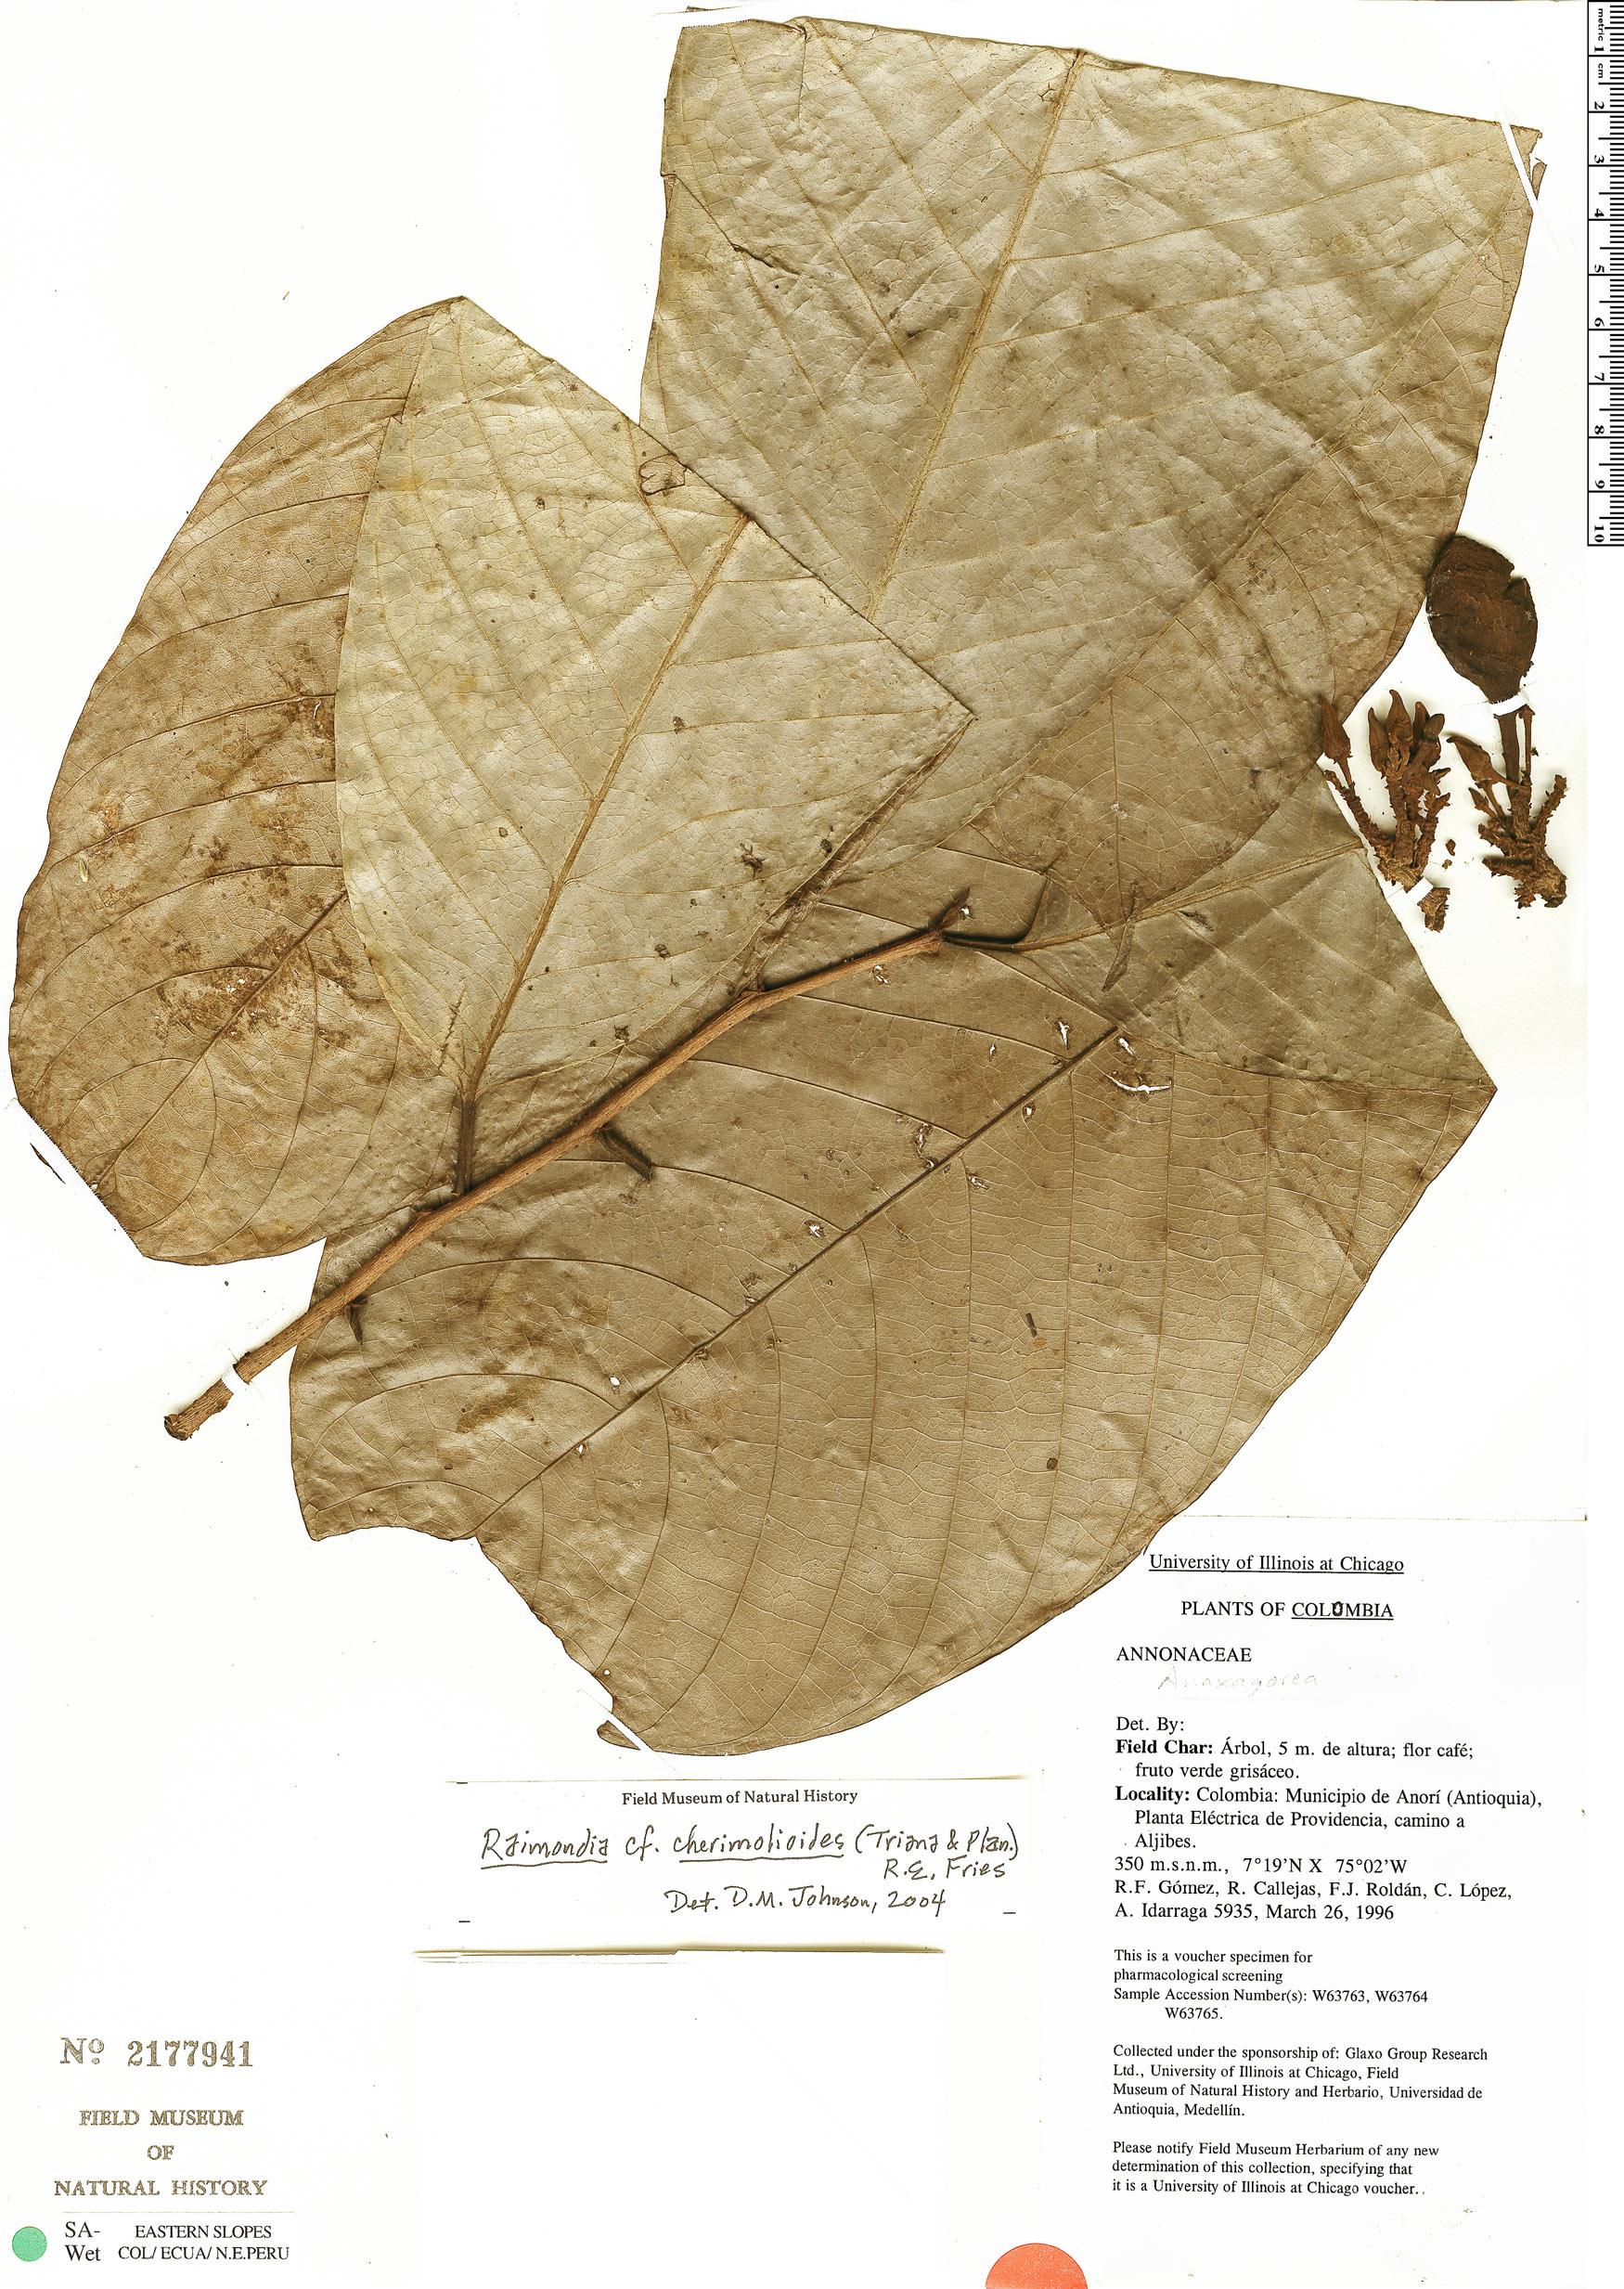 Specimen: Annona cherimolioides